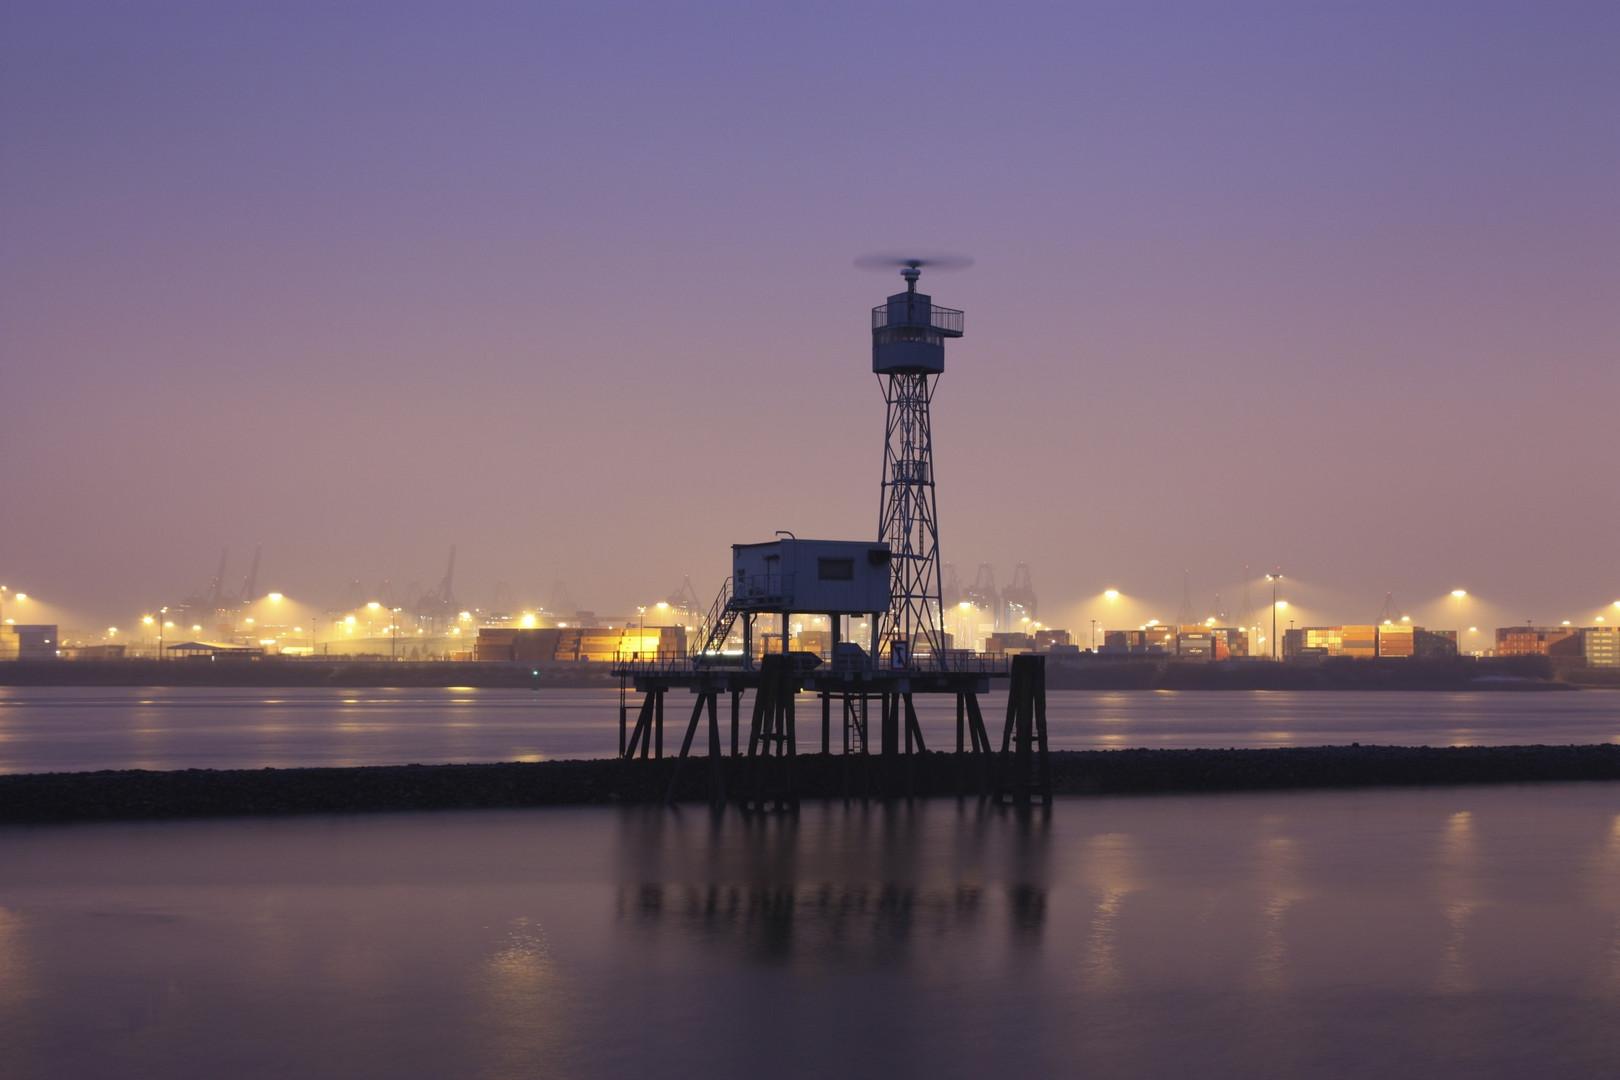 Radarstation im Hafen